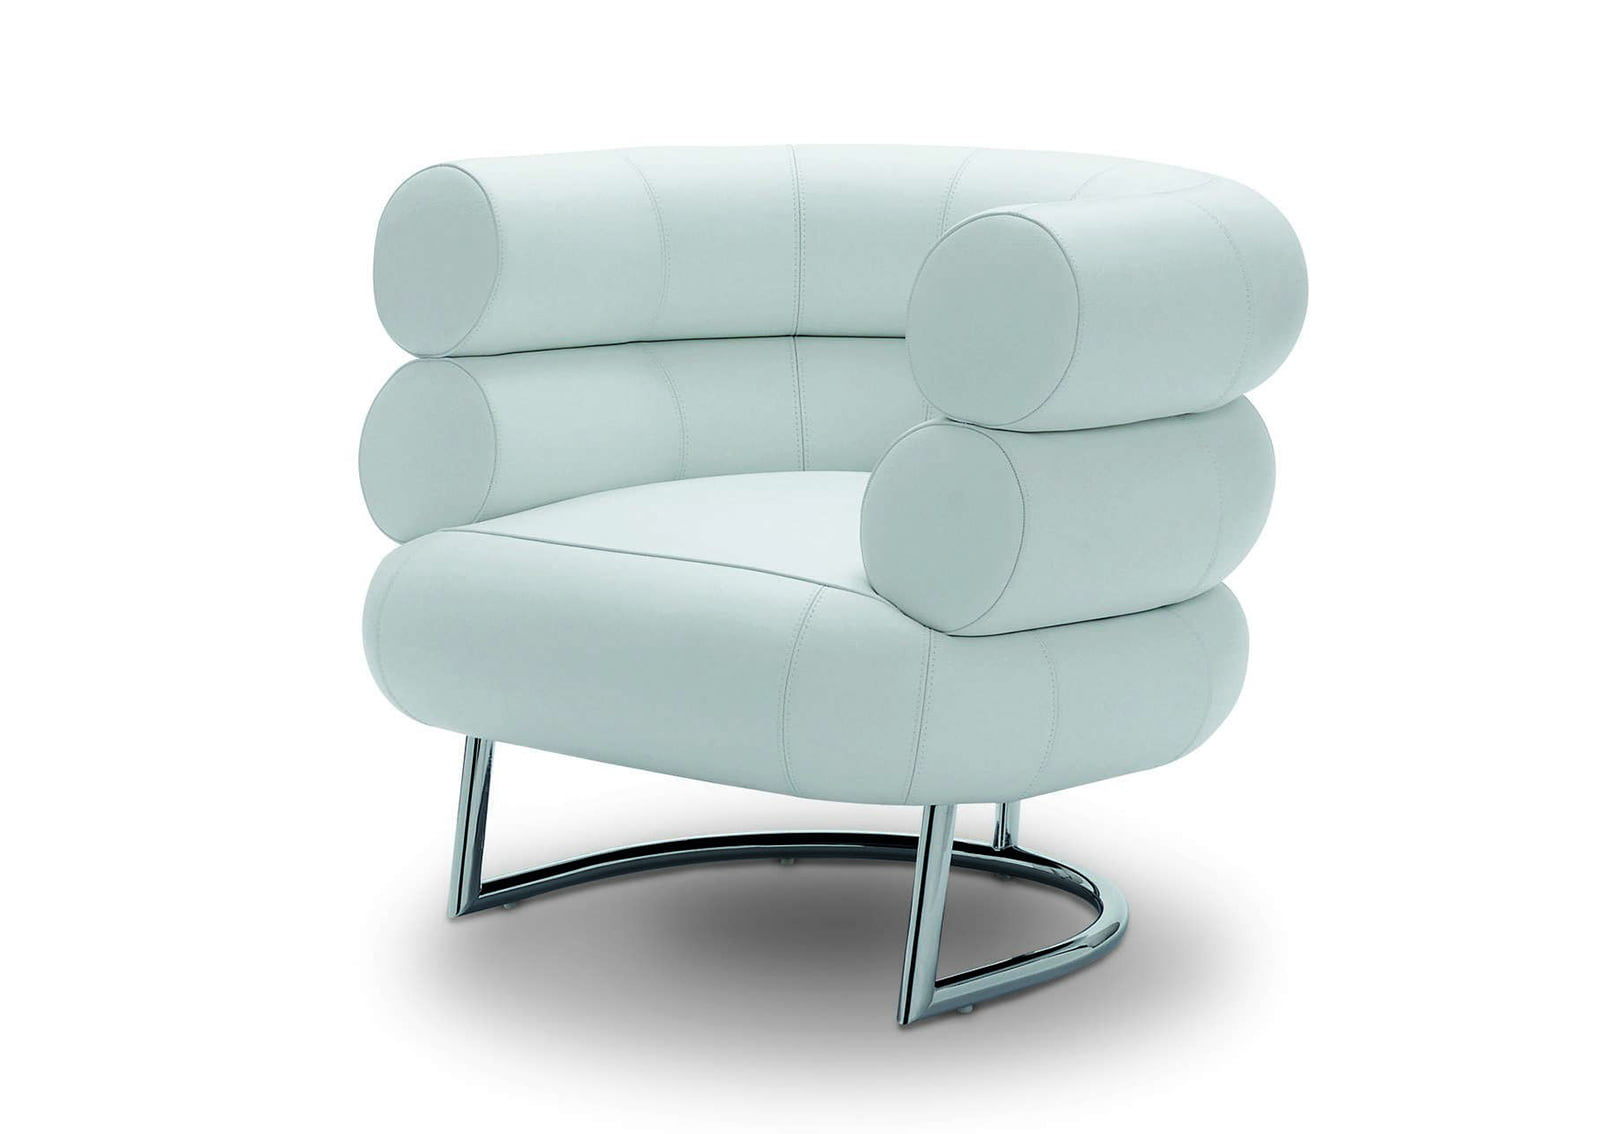 eileen gray bibendum chair eileen gray style furnishplus. Black Bedroom Furniture Sets. Home Design Ideas